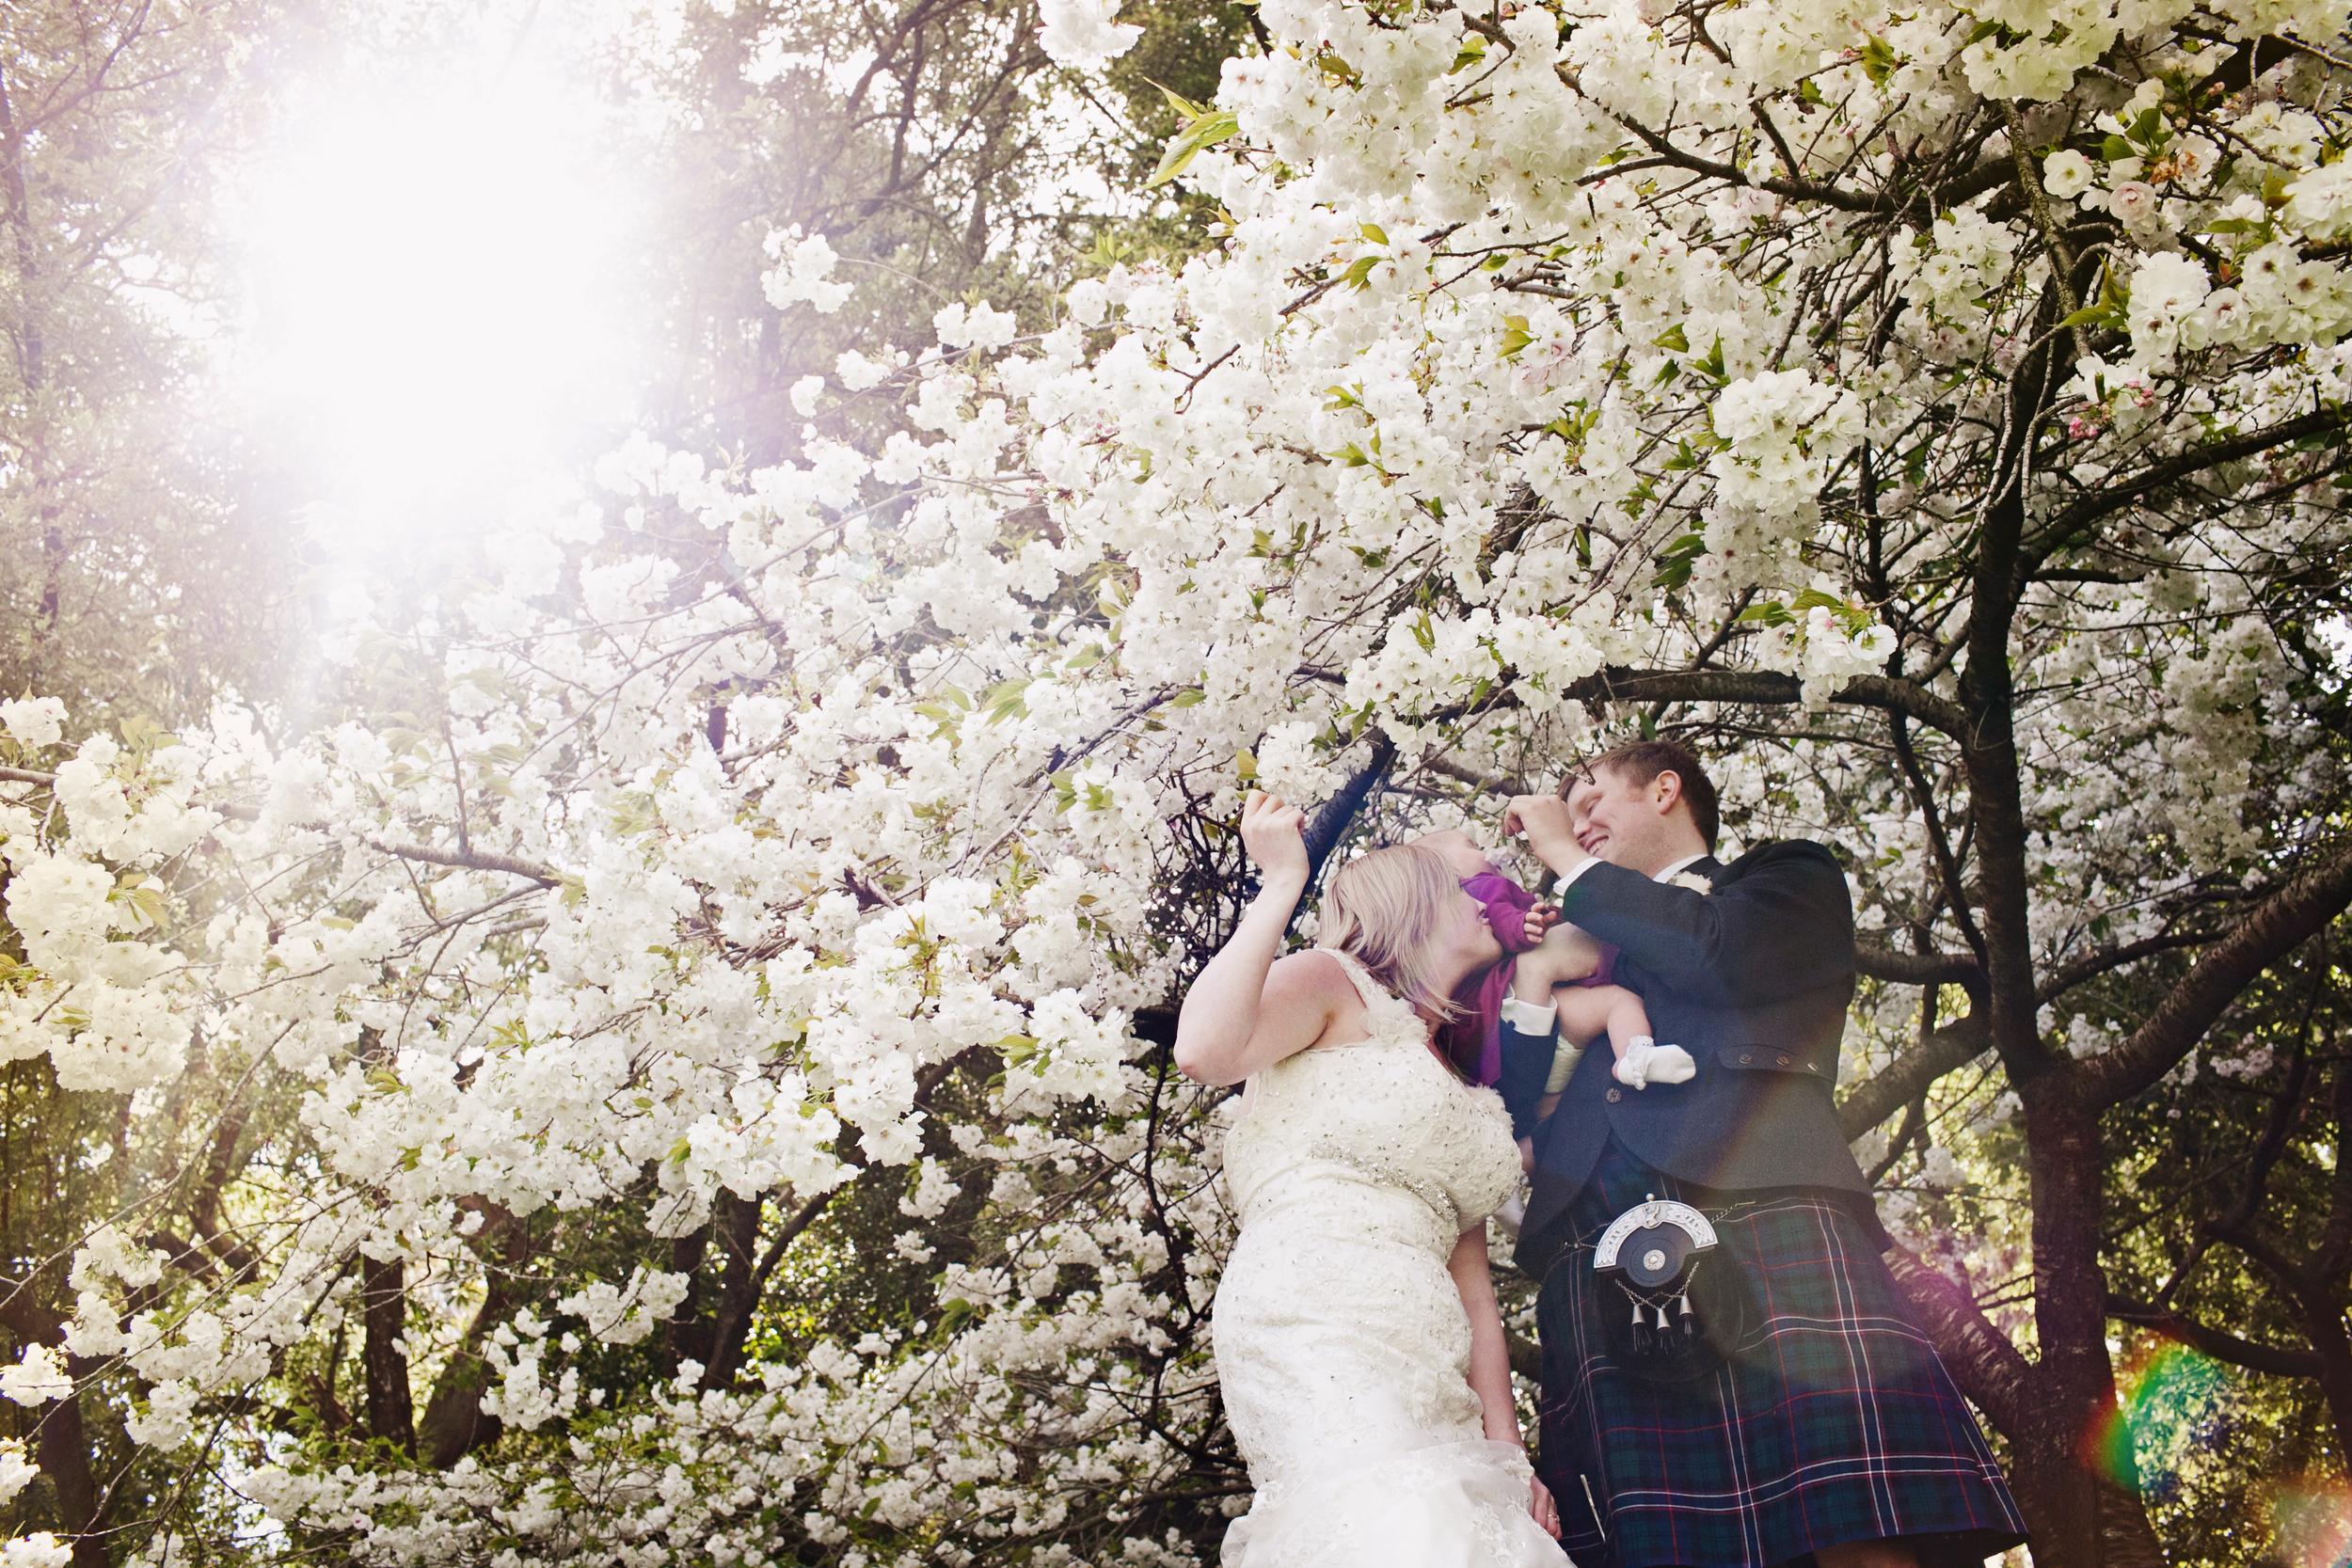 City_Hall_SF_Wedding_Photography-27.JPG